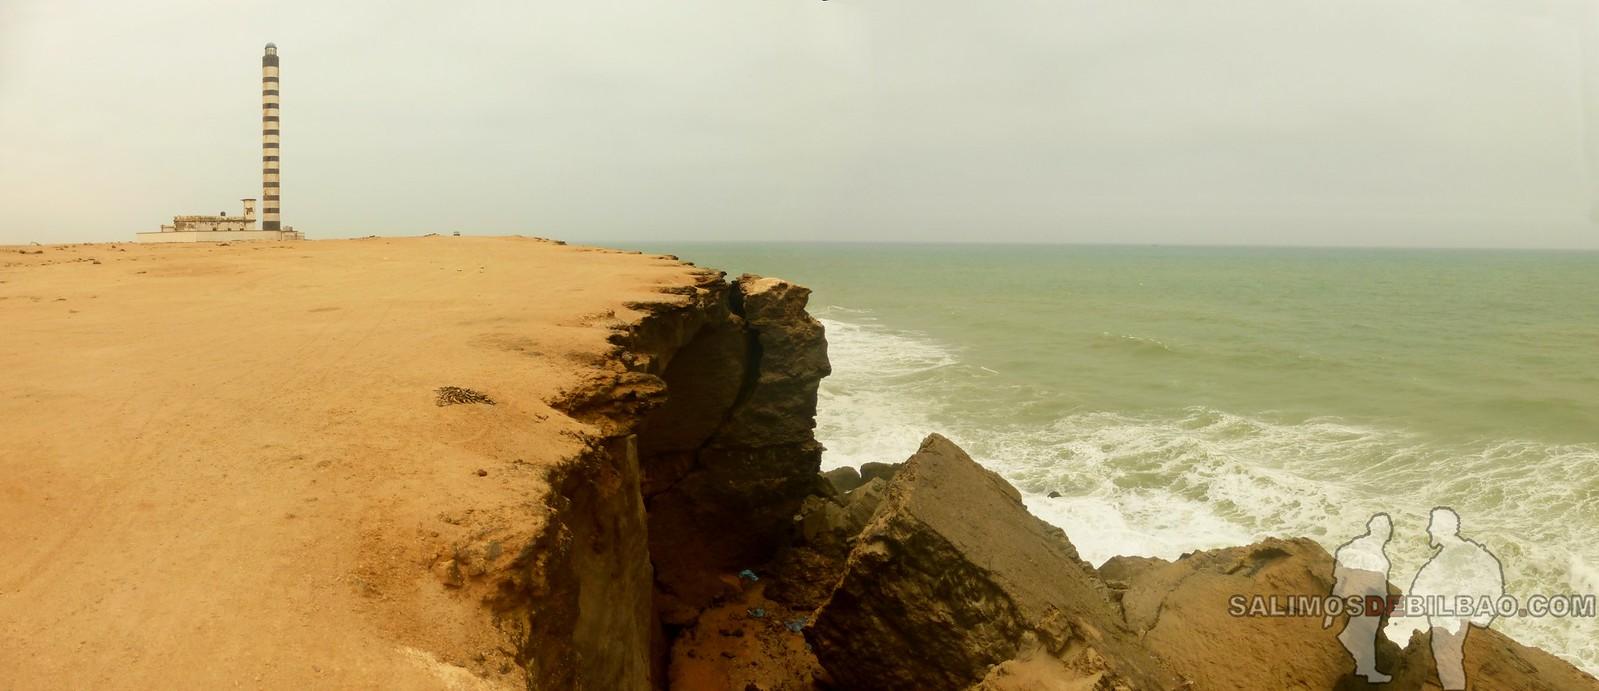 162. Pano, Paseo del Faro a la playa, Dakhla